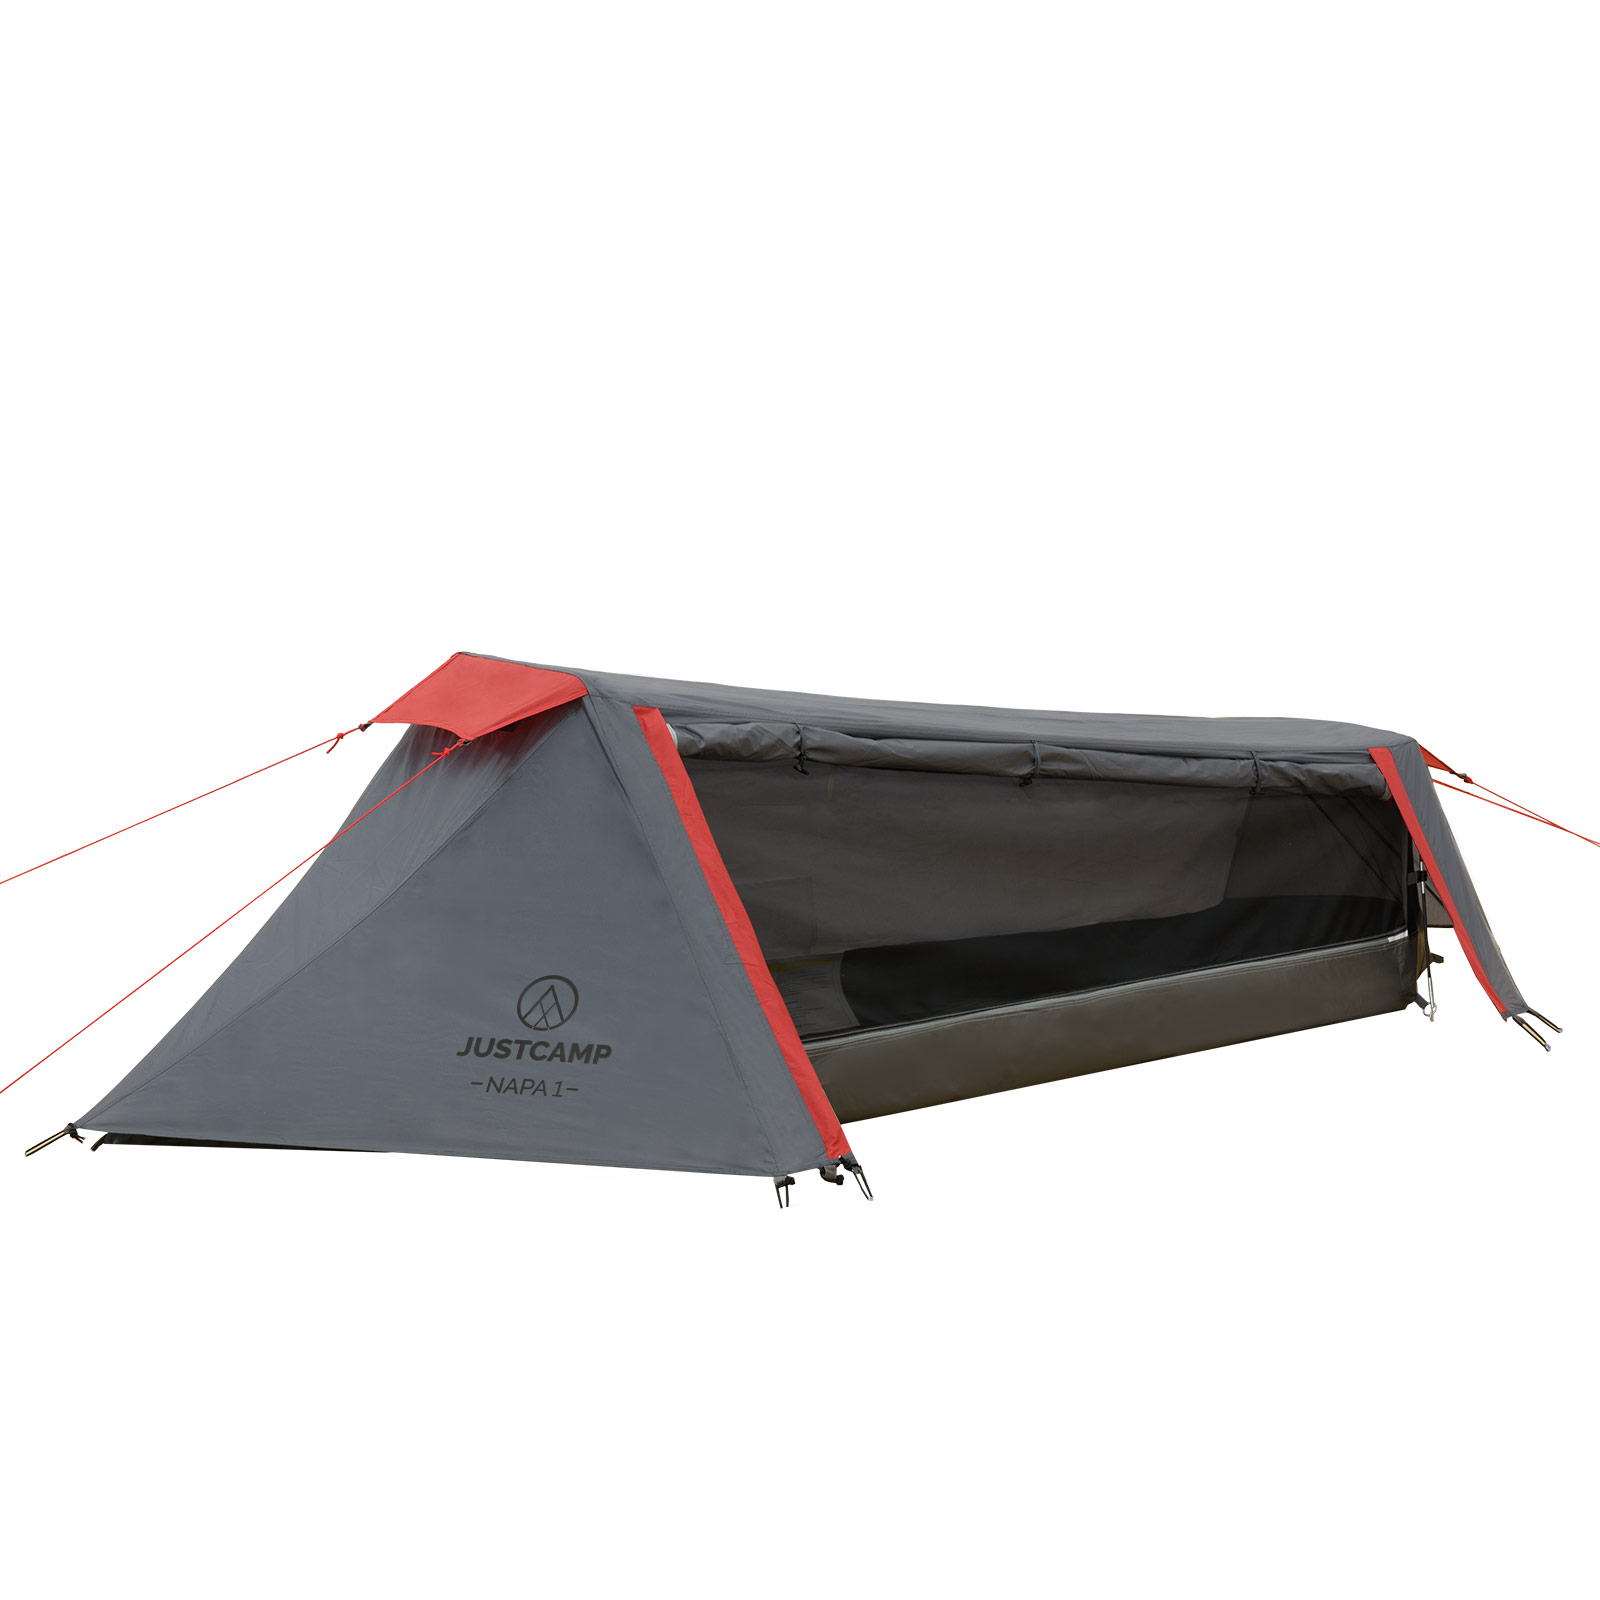 2 Personen Zelt 1 Kg : Trekkingzelt justcamp napa personen tunnelzelt nur